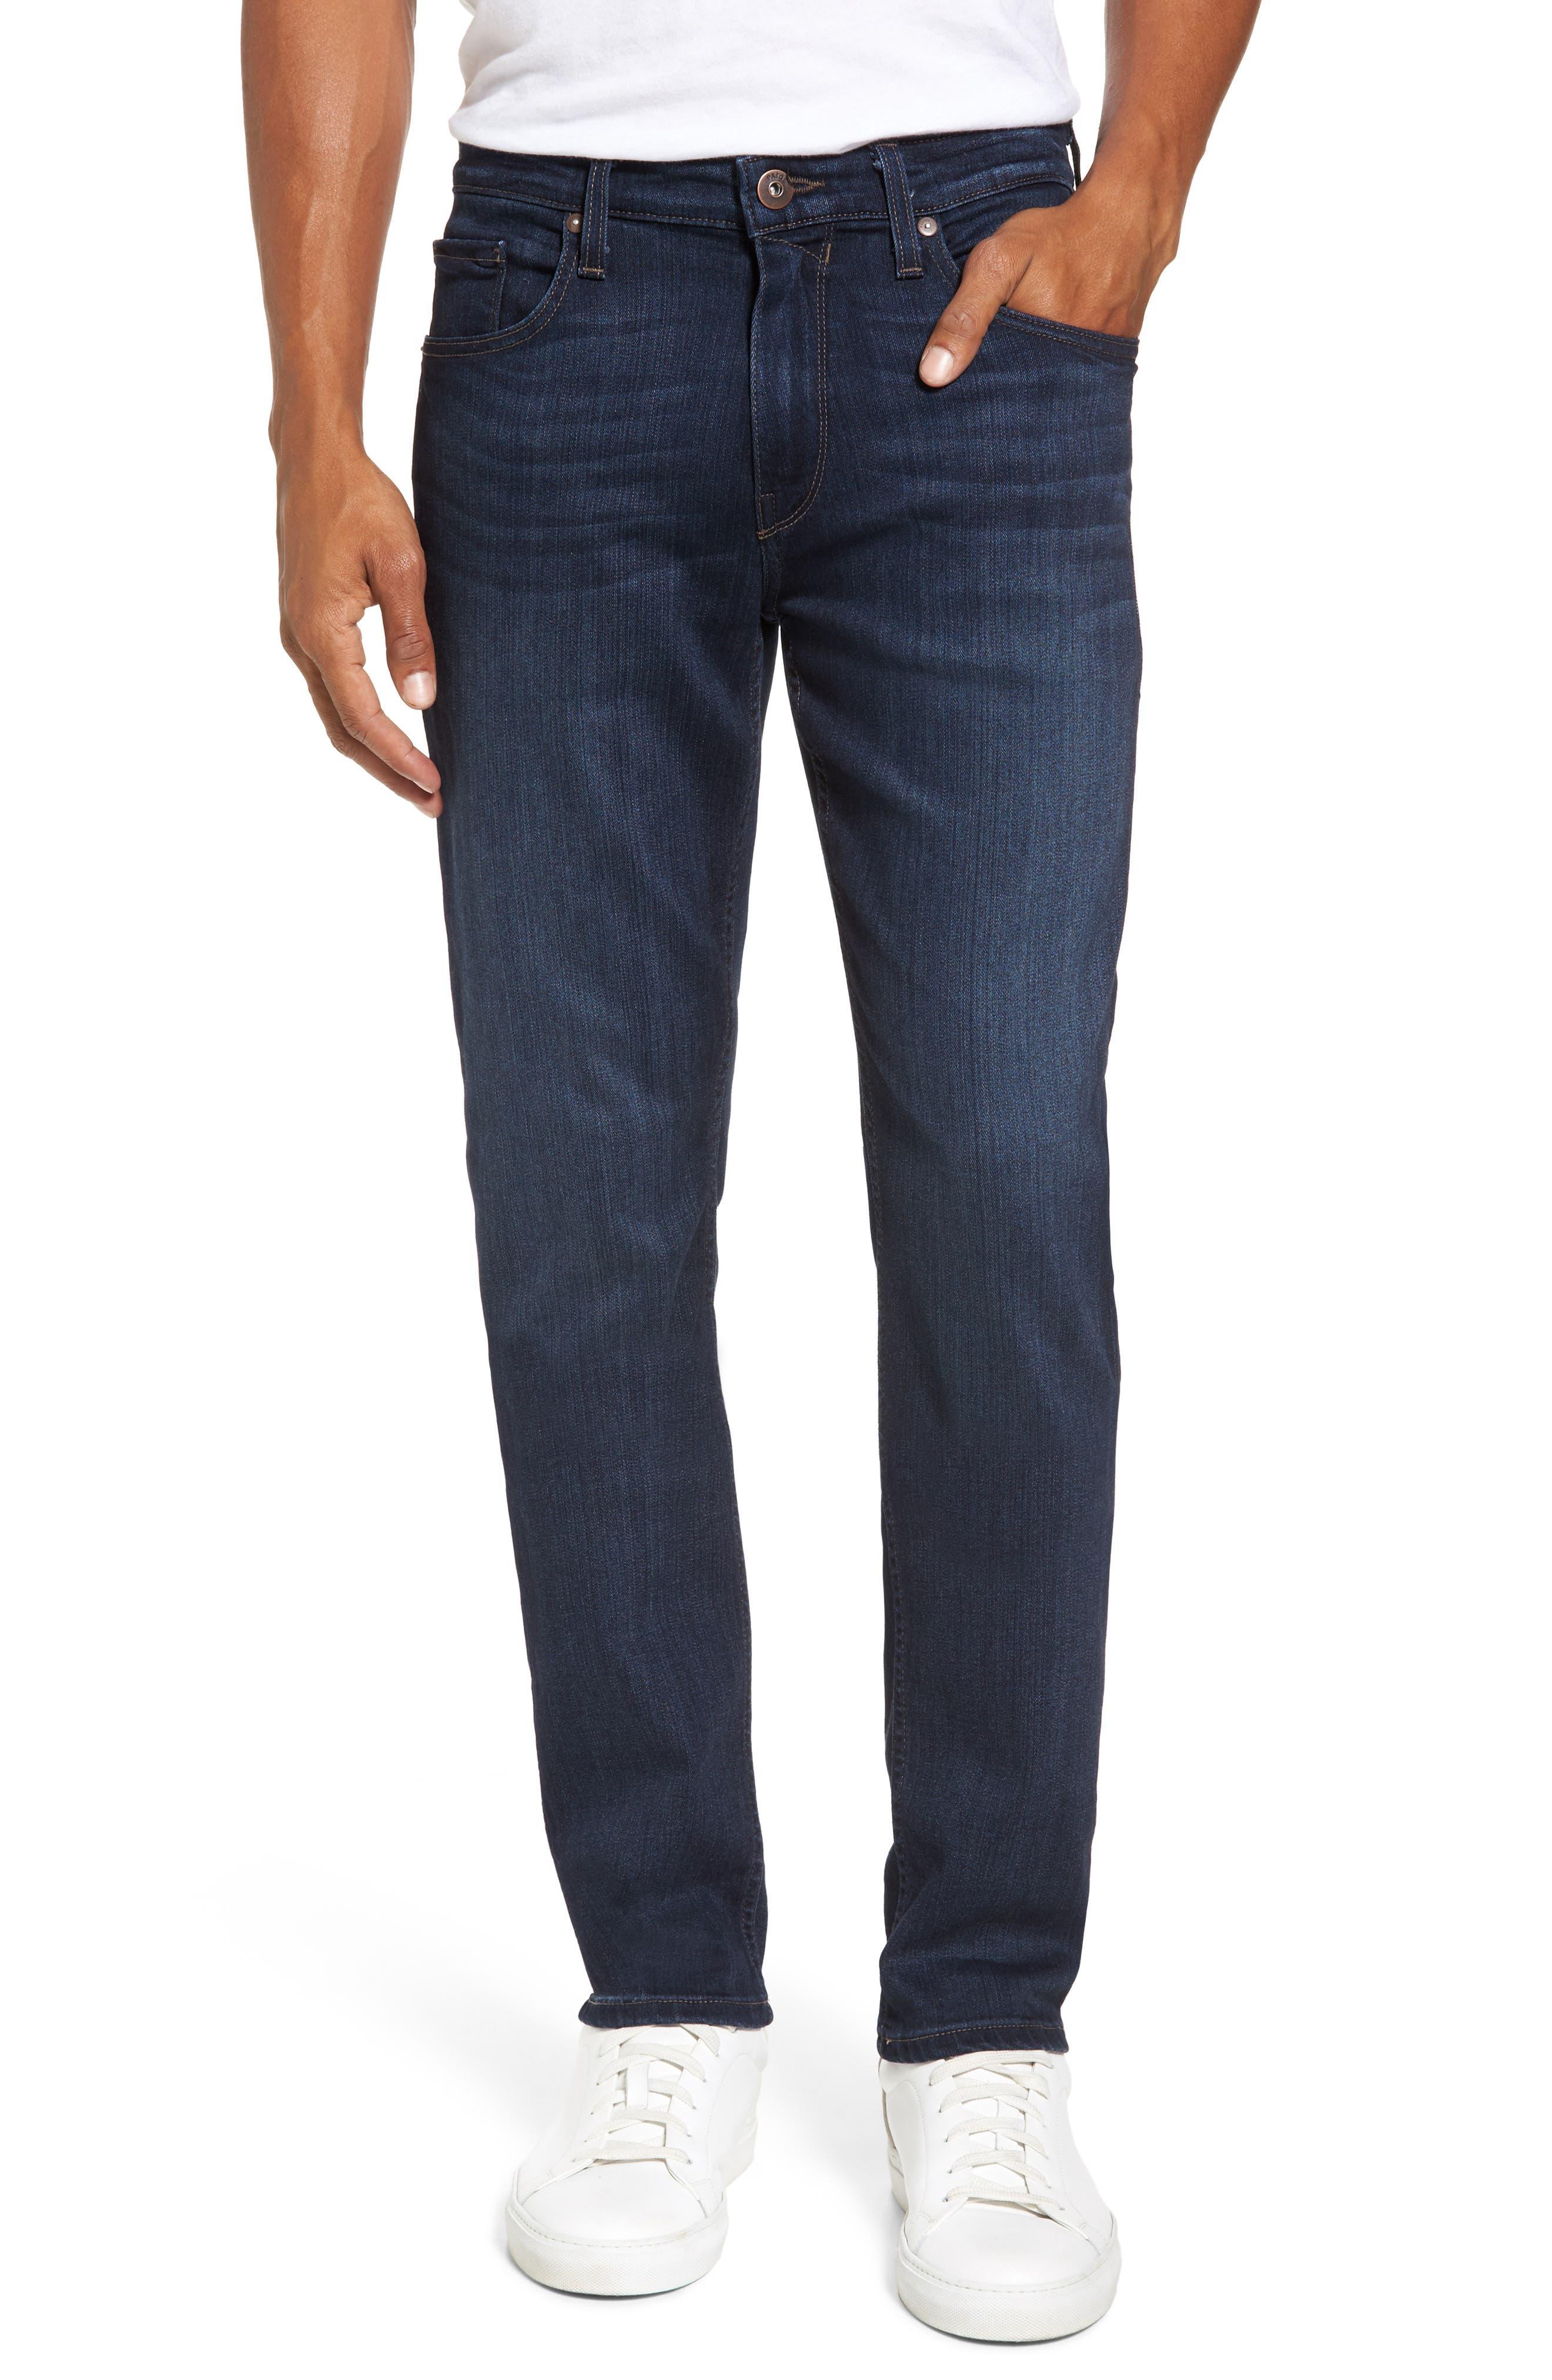 Main Image - PAIGE Transcend - Federal Slim Straight Leg Jeans (Barron)